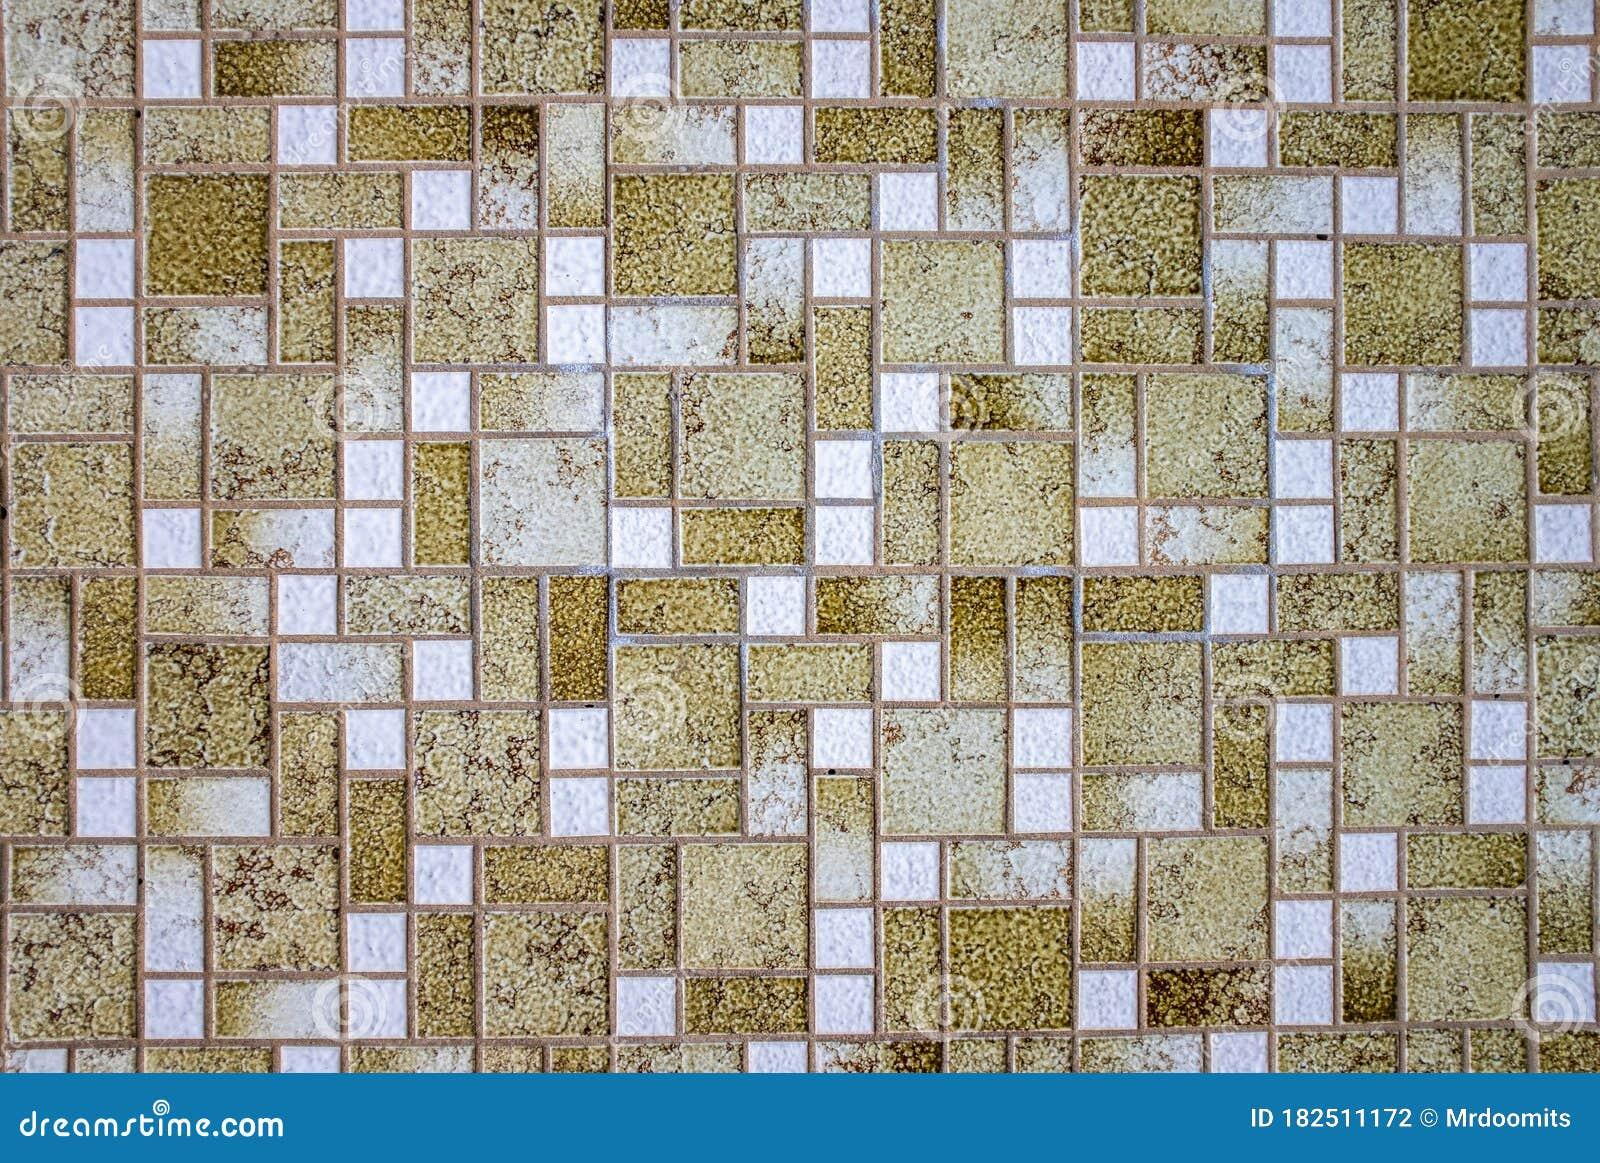 Retro Ugly 1970s Mosaic Tiles Stock Photo Image Of Background Grim 182511172